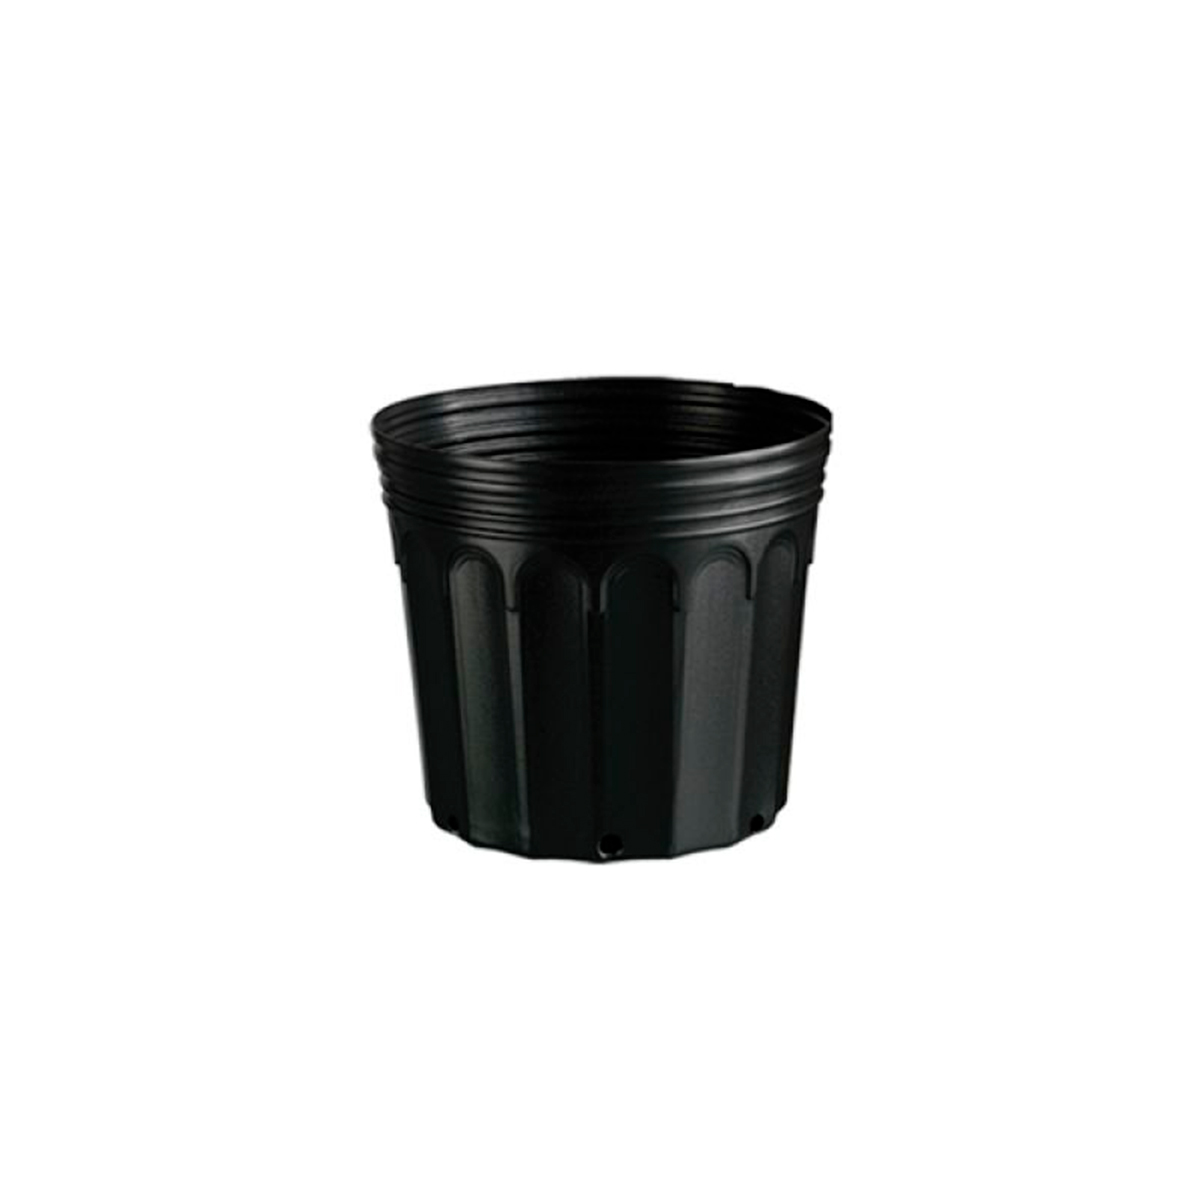 Kit 10 Embalagem Vaso para Mudas Plástico 3,6L